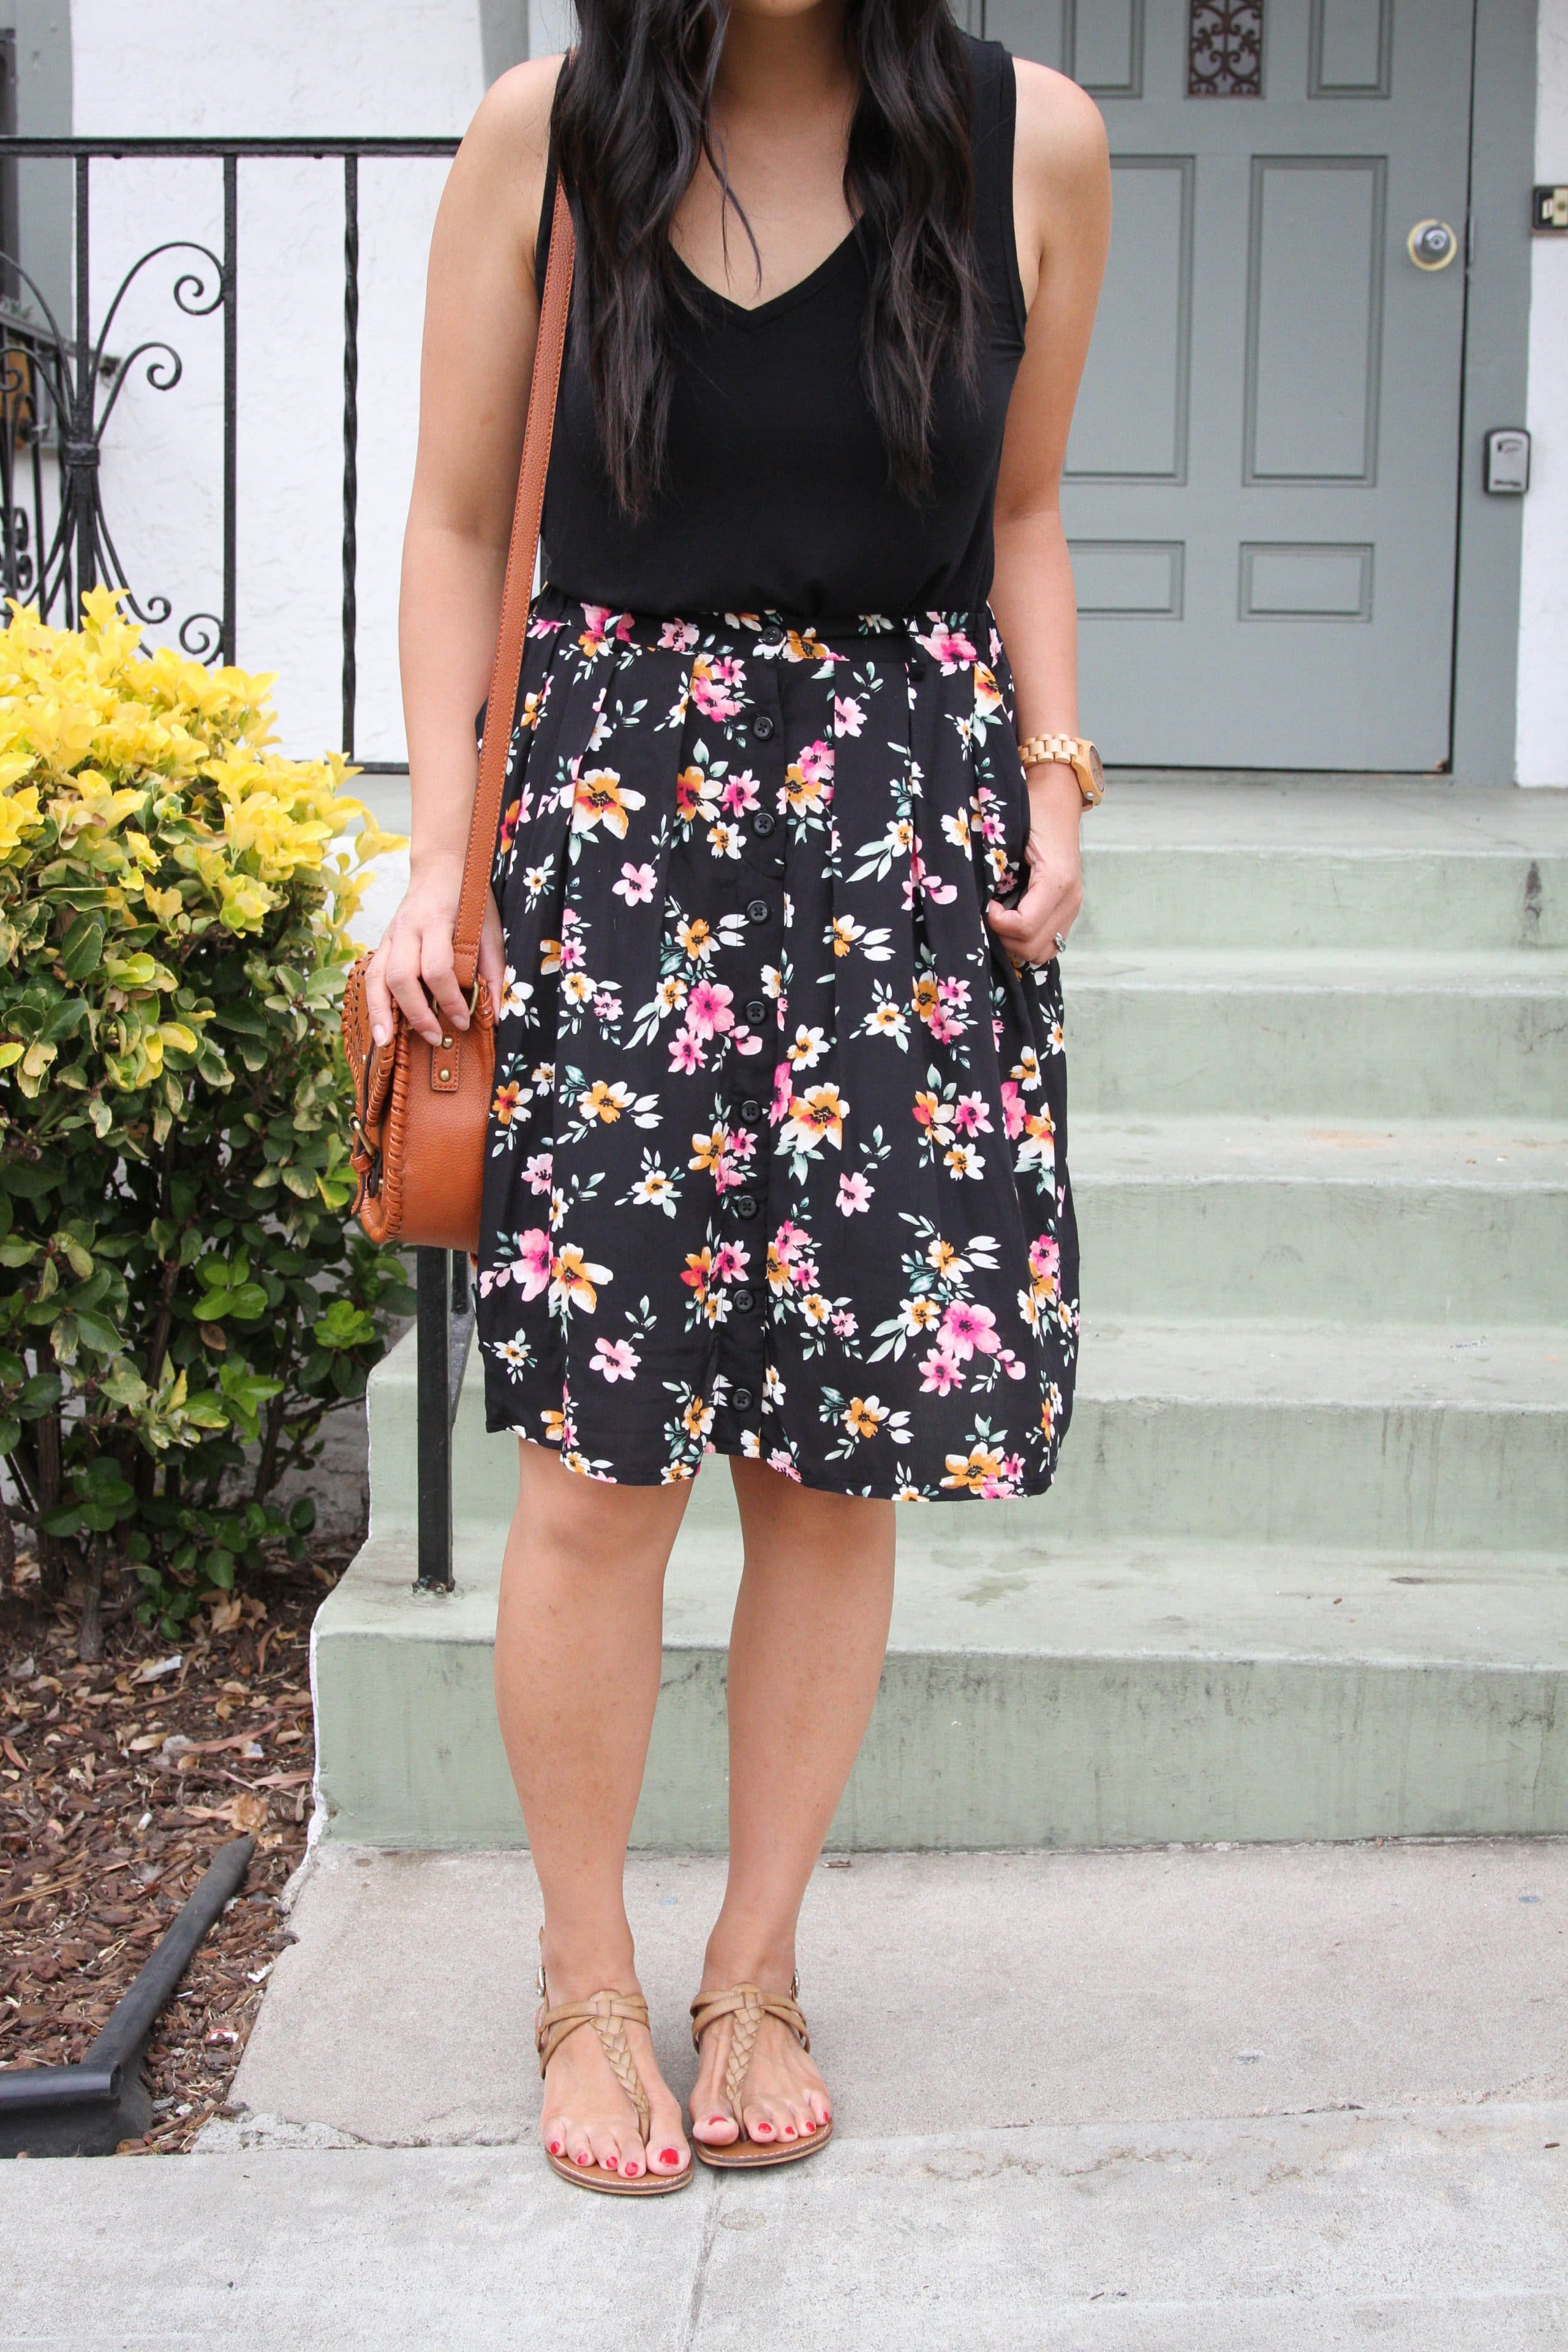 black floral skirt + black tank top + tan braided sandals